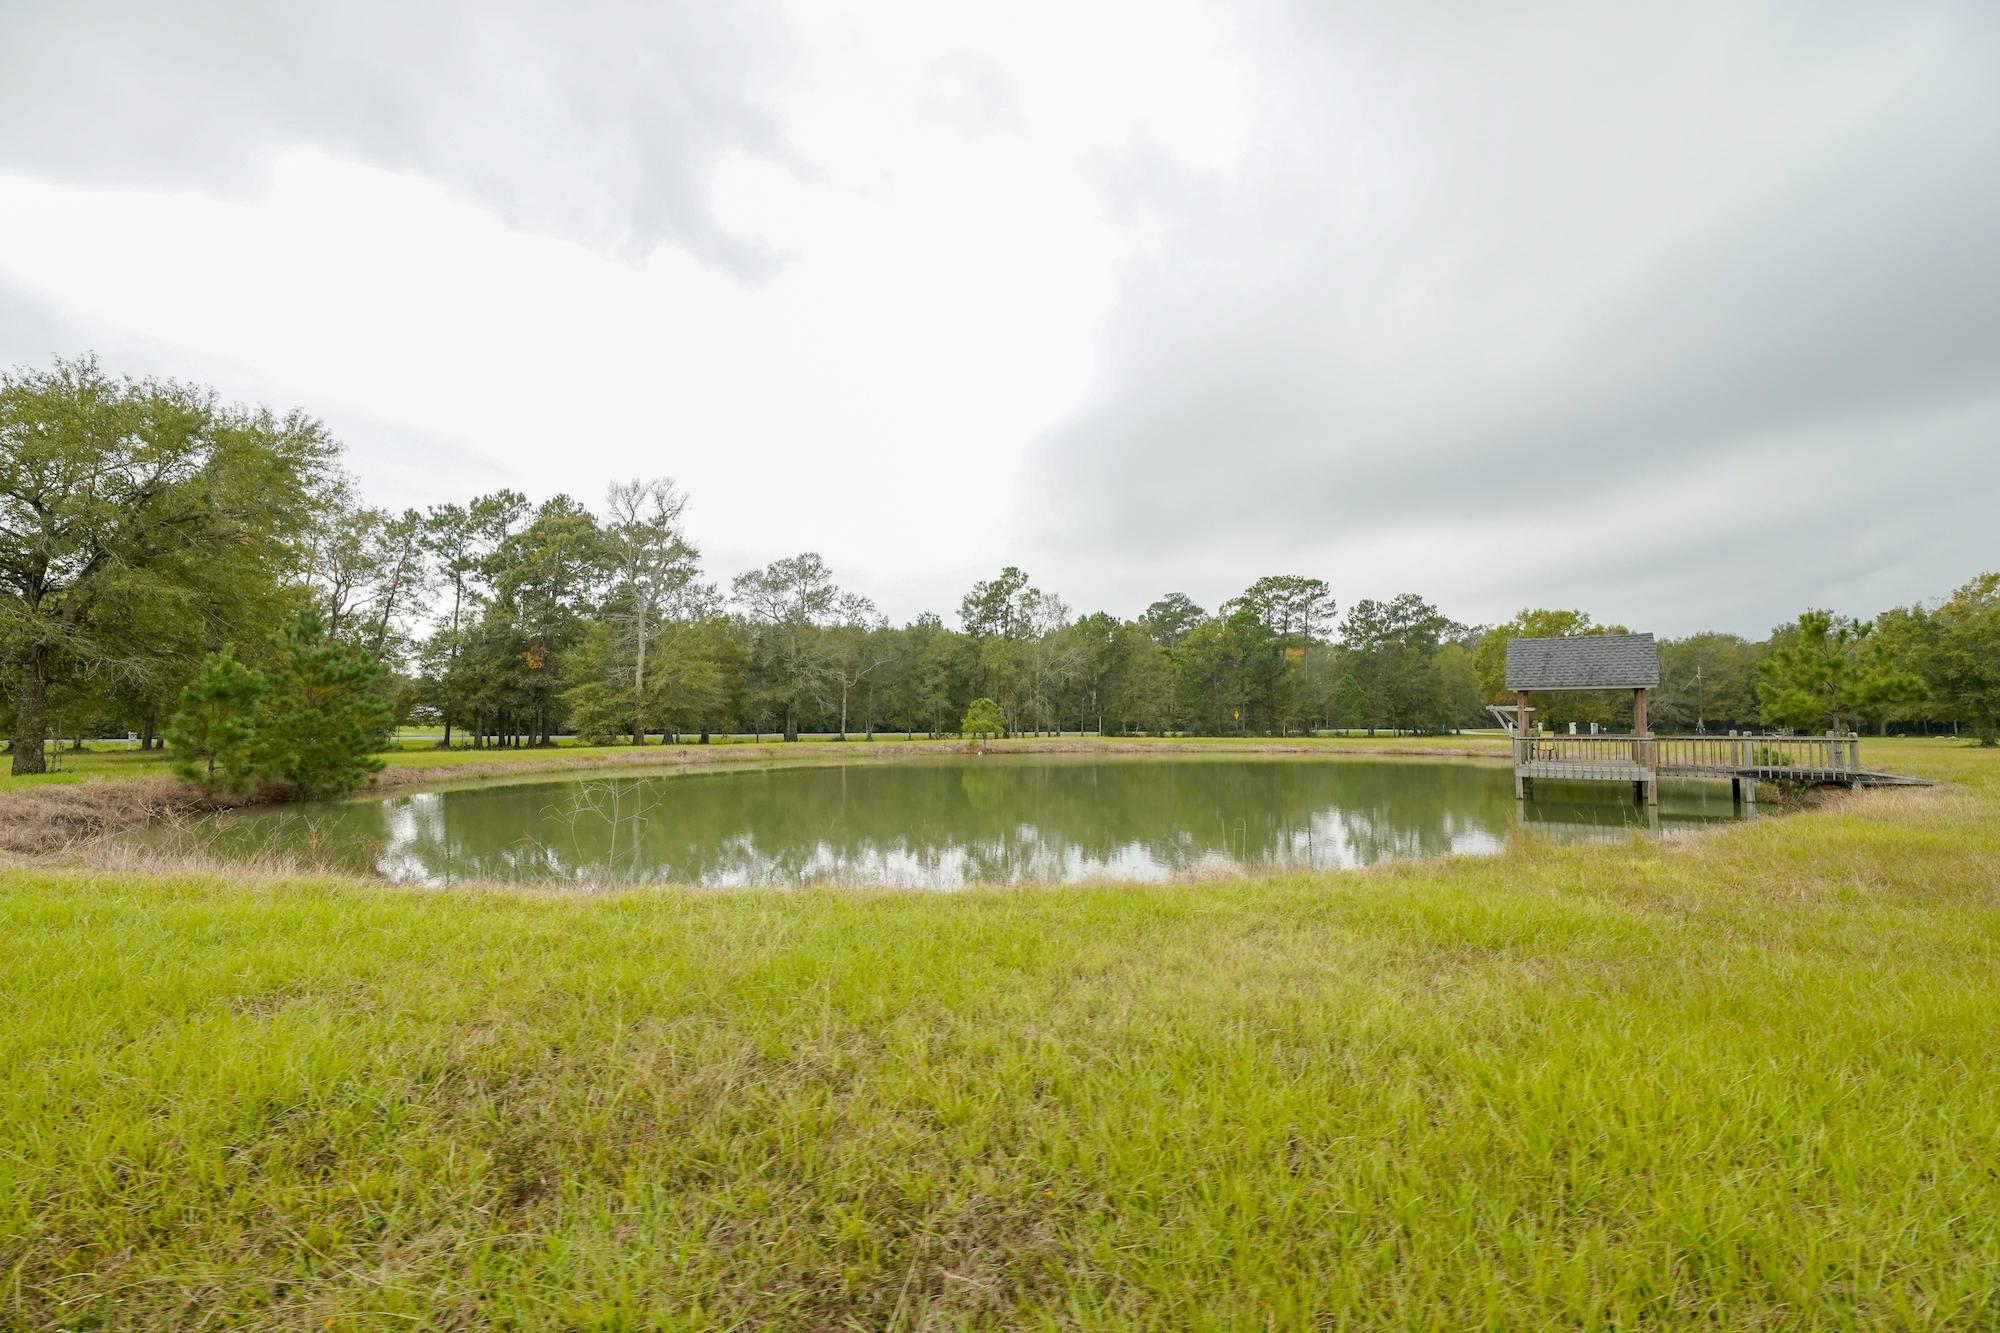 Jefferson County Development Land - Image 22 of 36